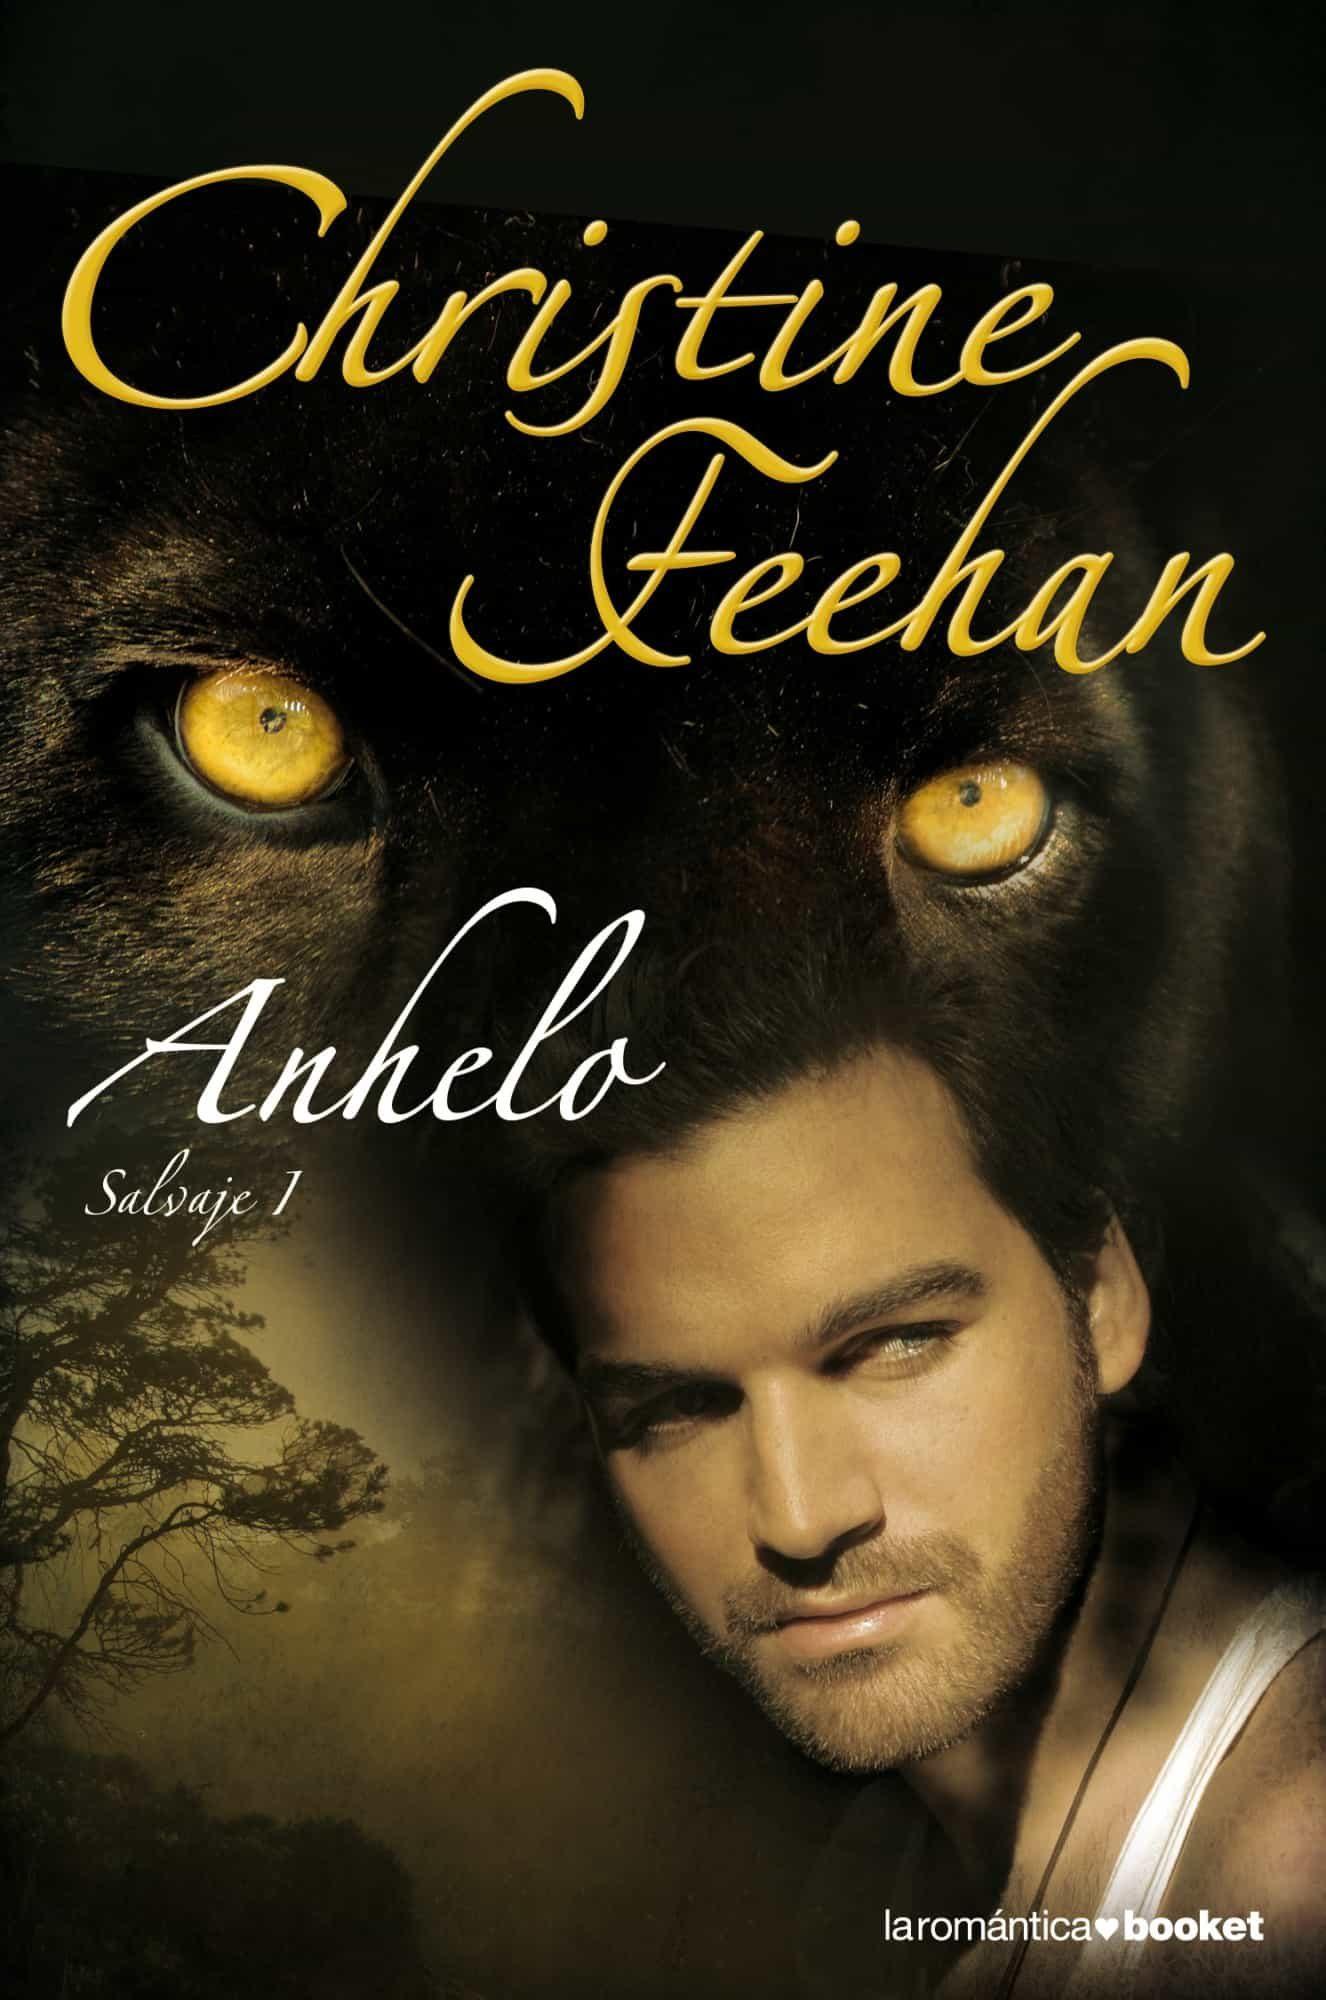 Christine Feehan - Peuple Leopard 01 - Anhelo (nouvelle : The awakening + Wild rain) Anhelo-salvaje-i-9788408101727